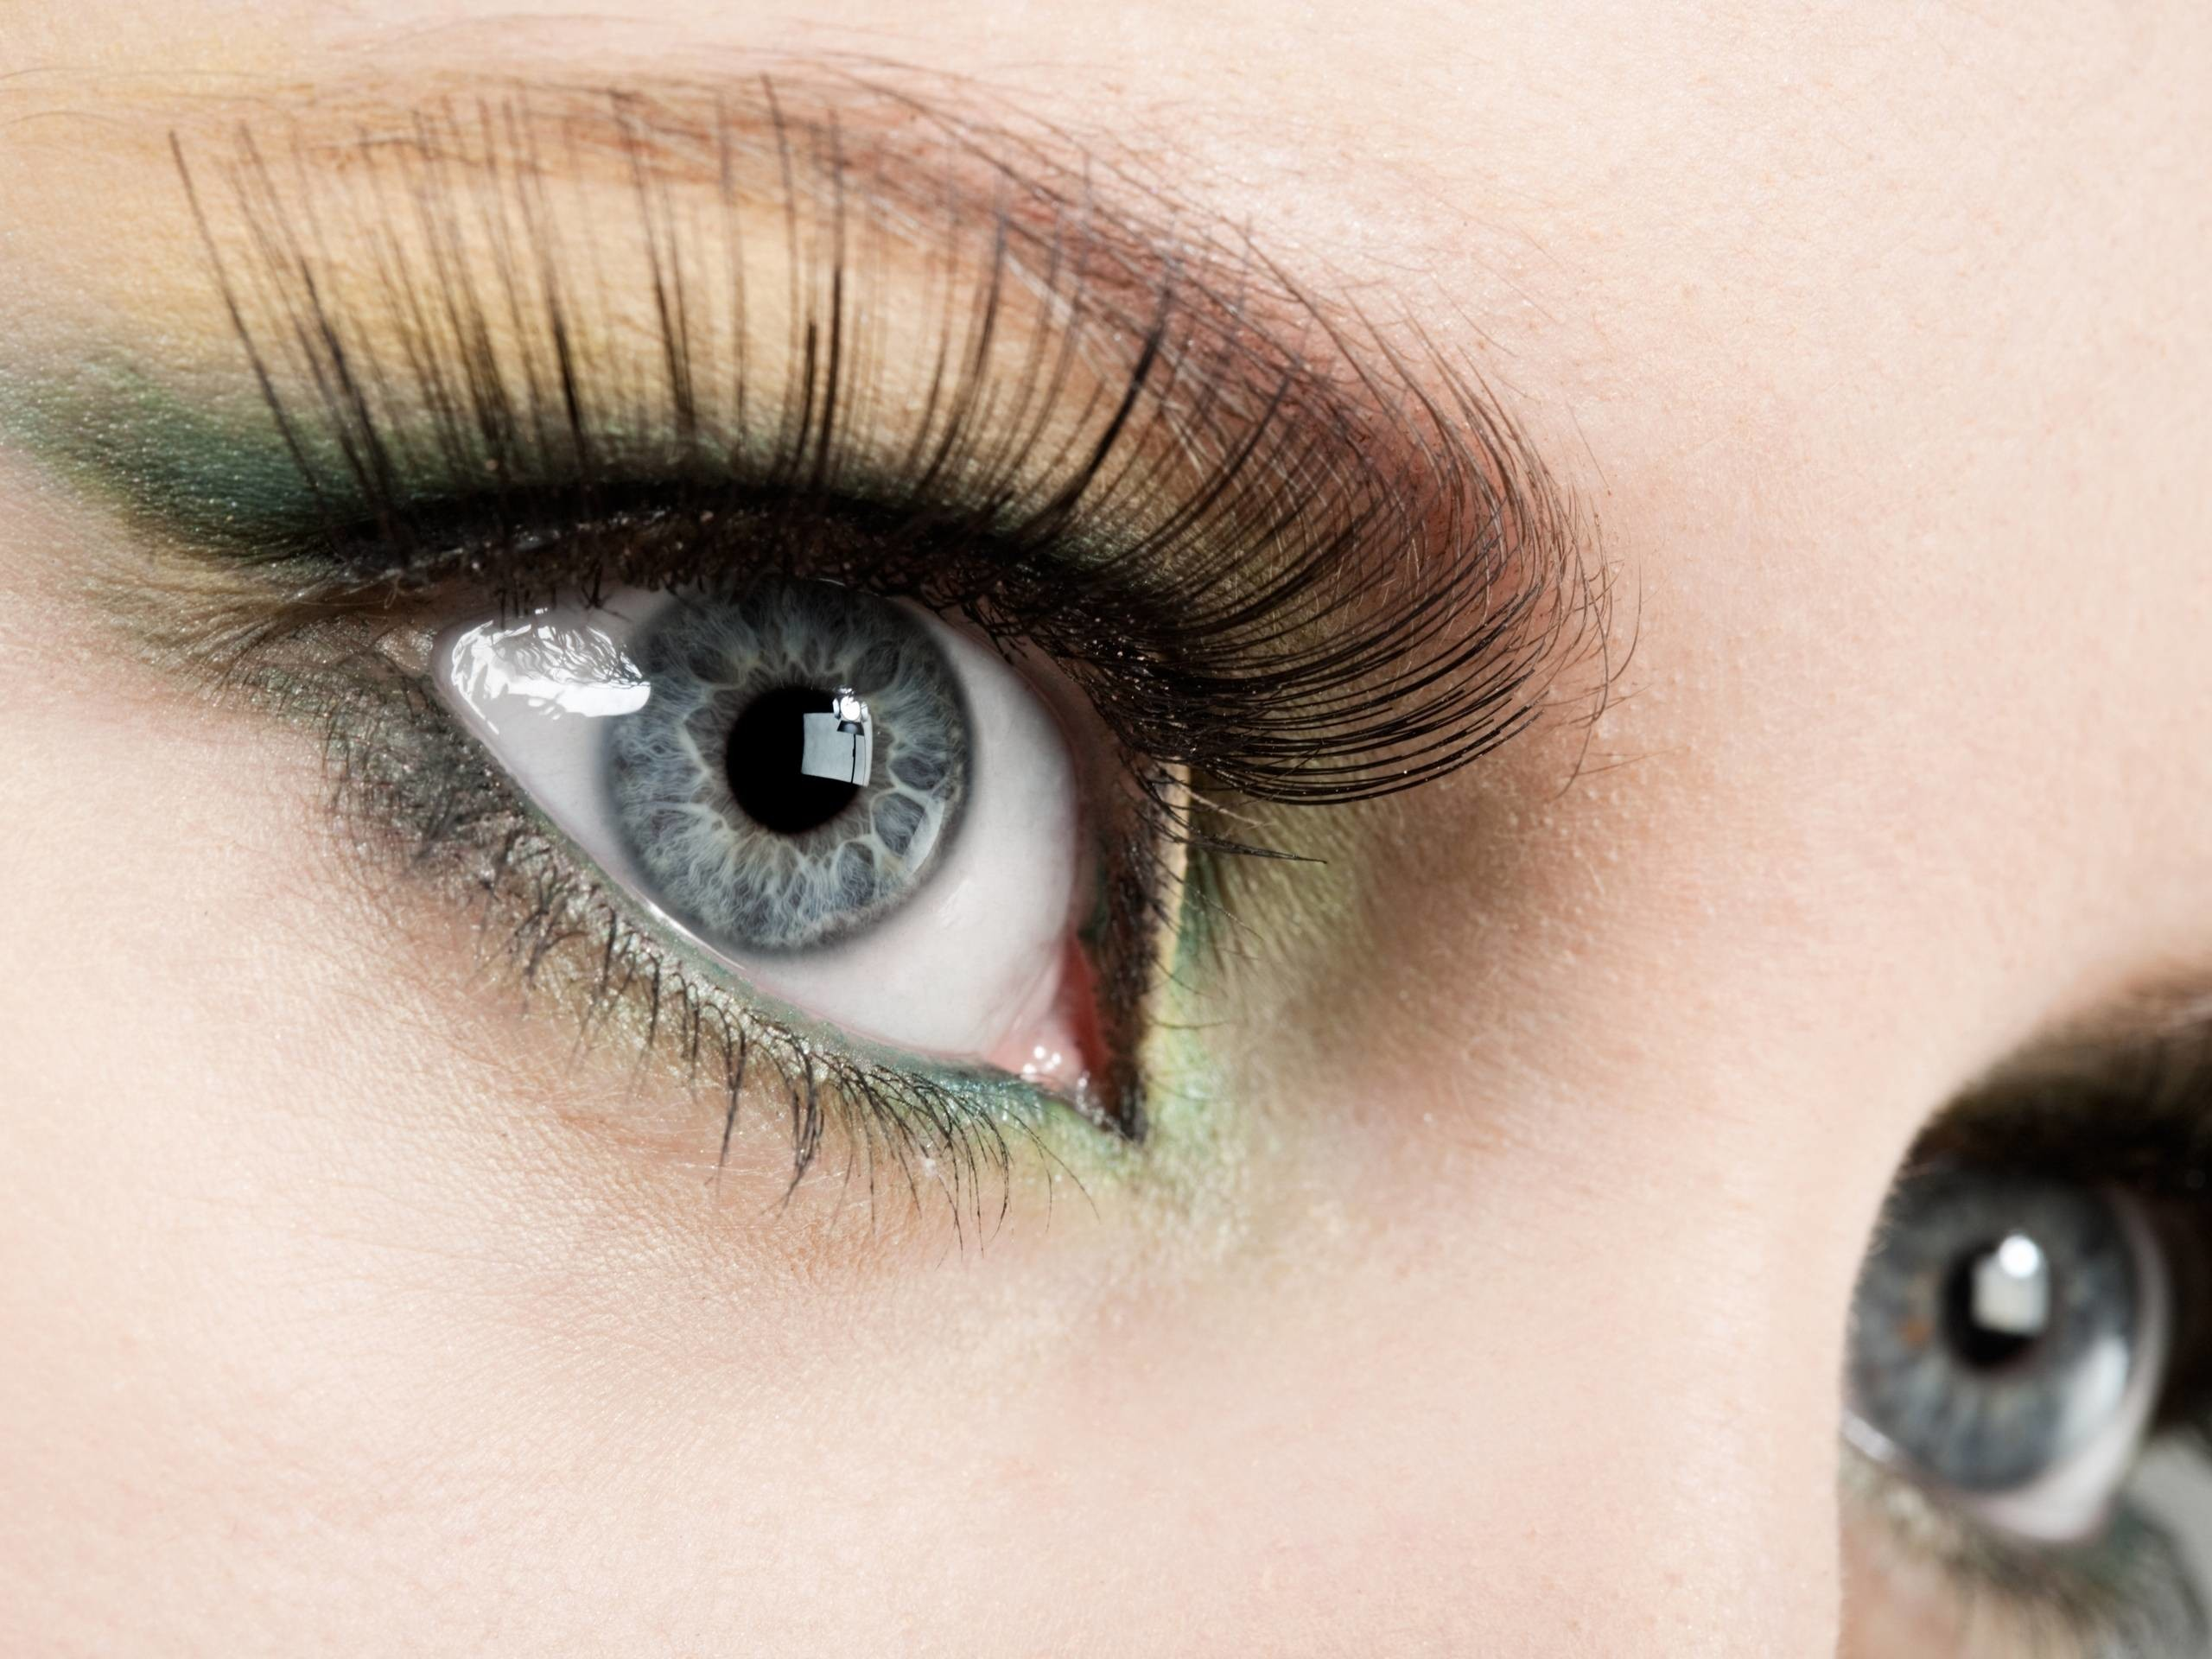 eye wallpaper download,eyebrow,eyelash,eye,face,green